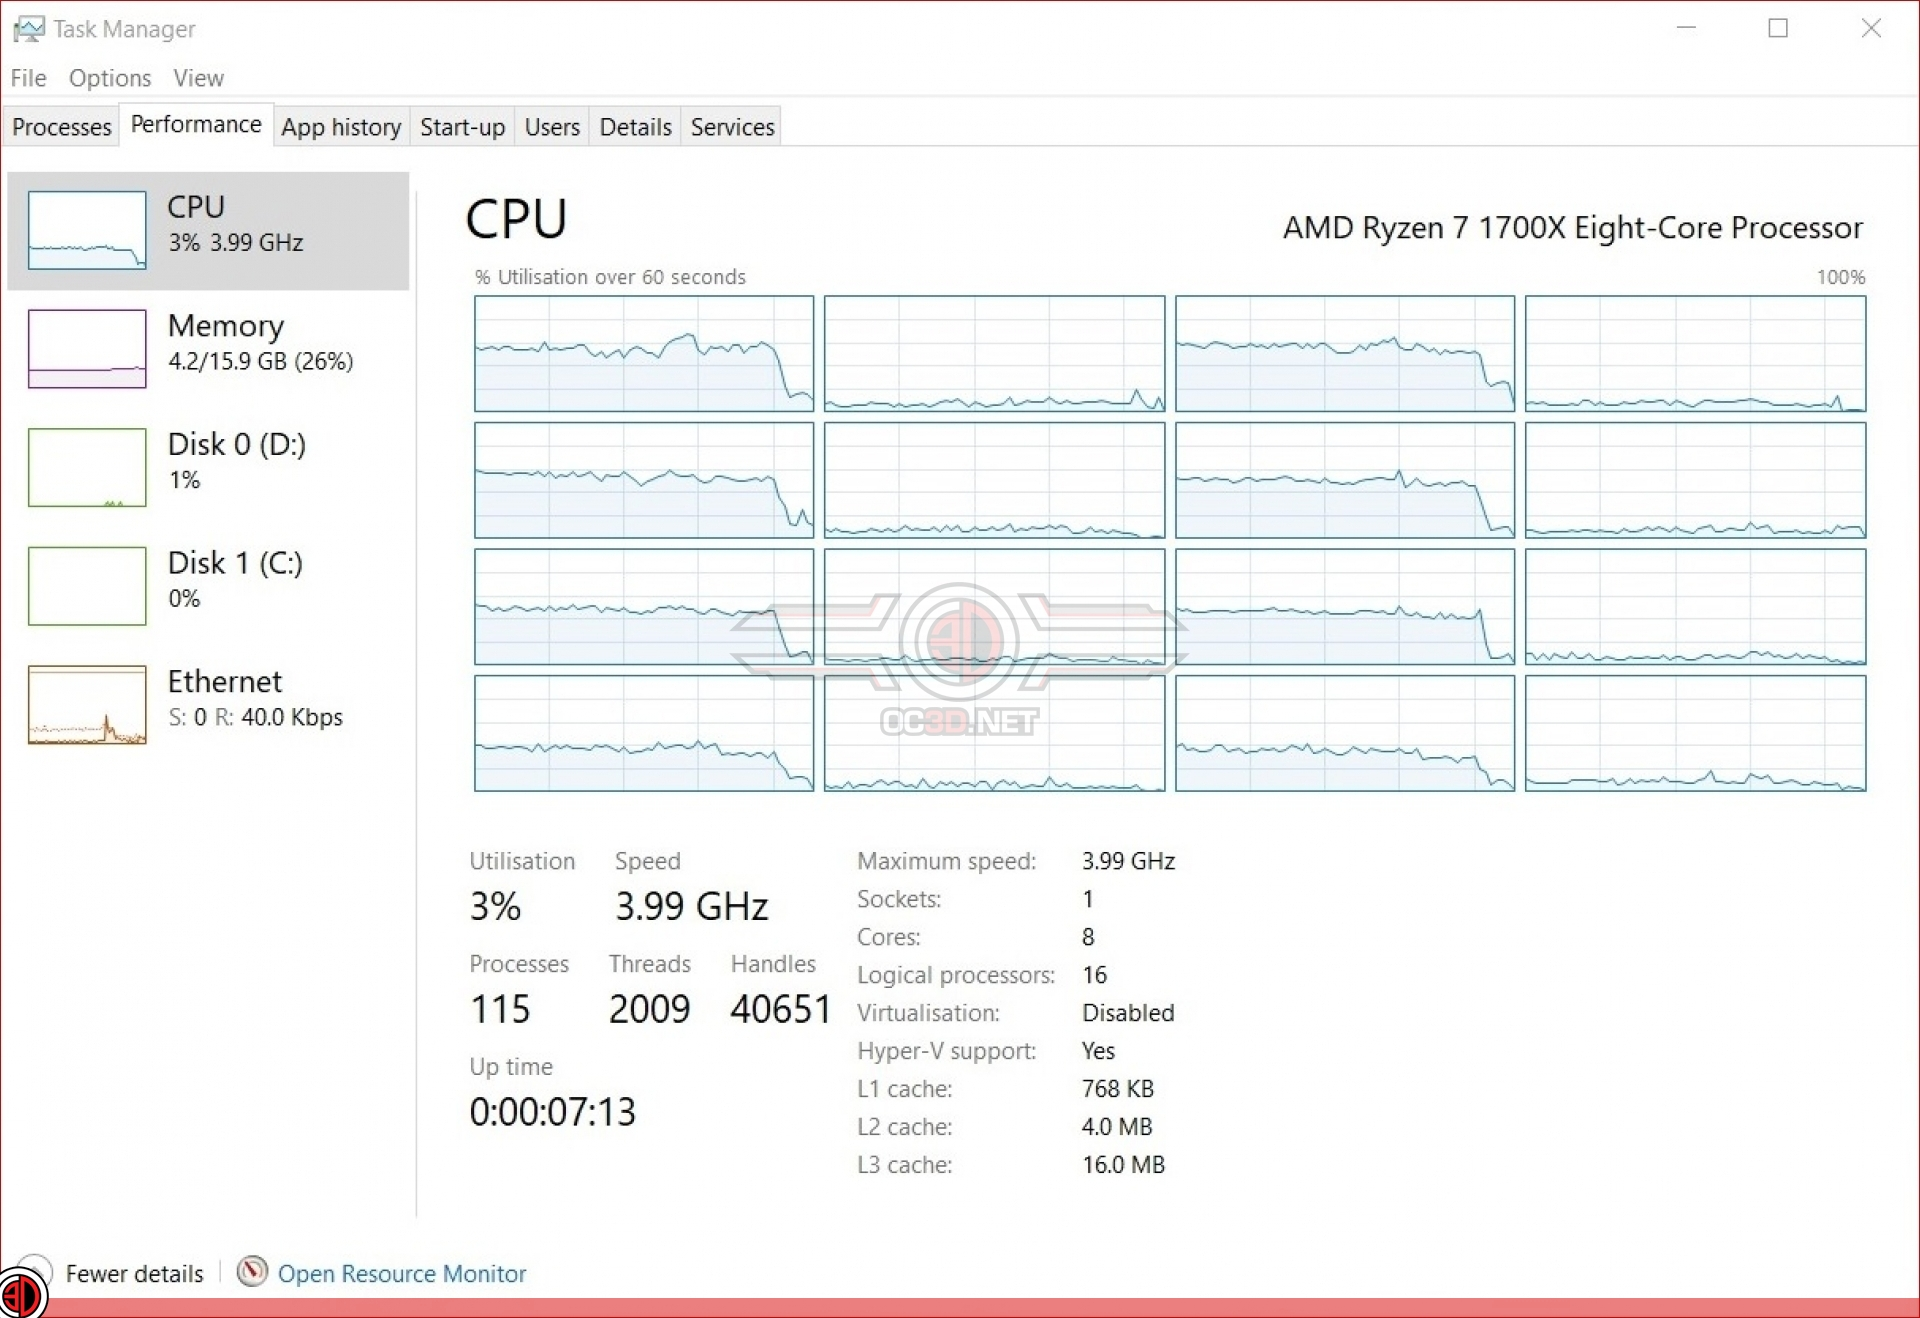 Destiny 2 Beta PC Performance Review | CPU Performance - Ryzen